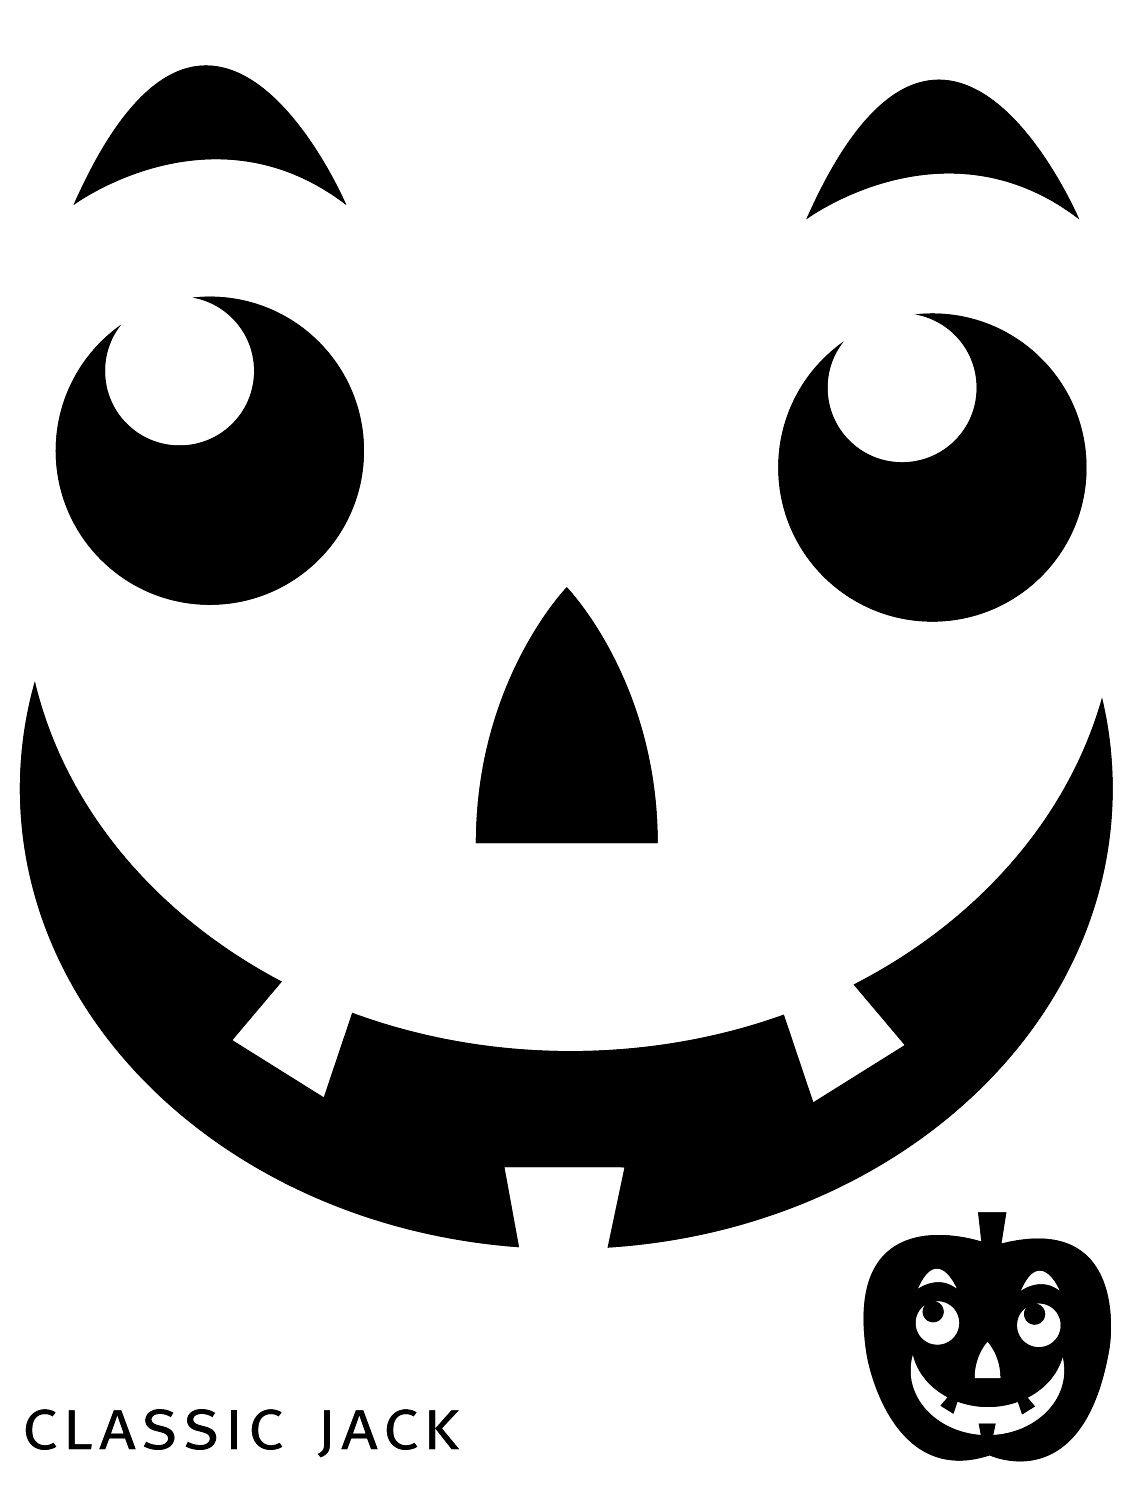 Free Printable Easy Funny Jack O Lantern Face Stencils Patterns - Jack O Lantern Templates Printable Free